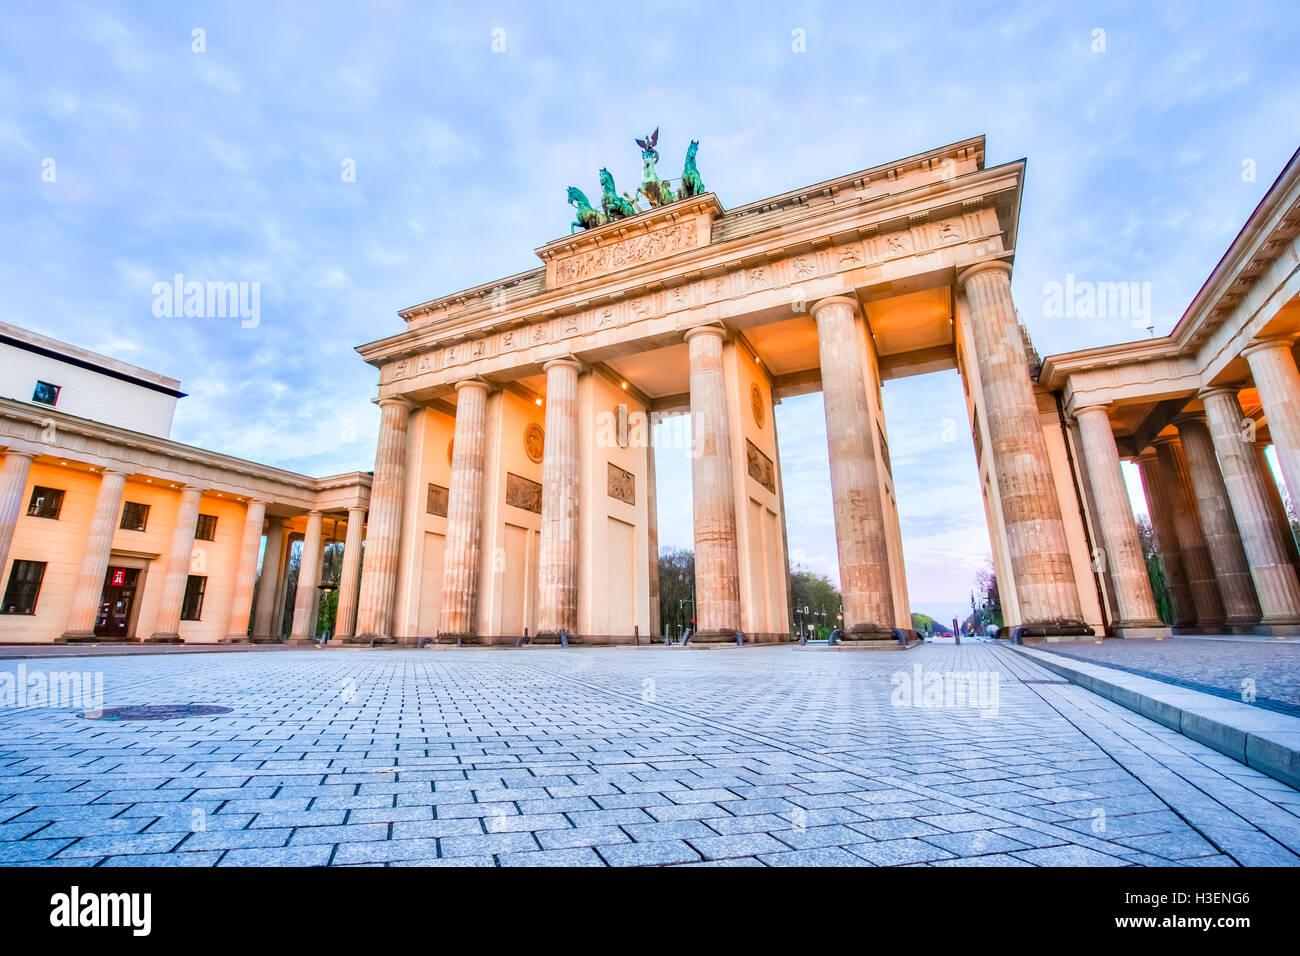 Sunrise at The Brandenburg Gate in Berlin, Germany. Stock Photo